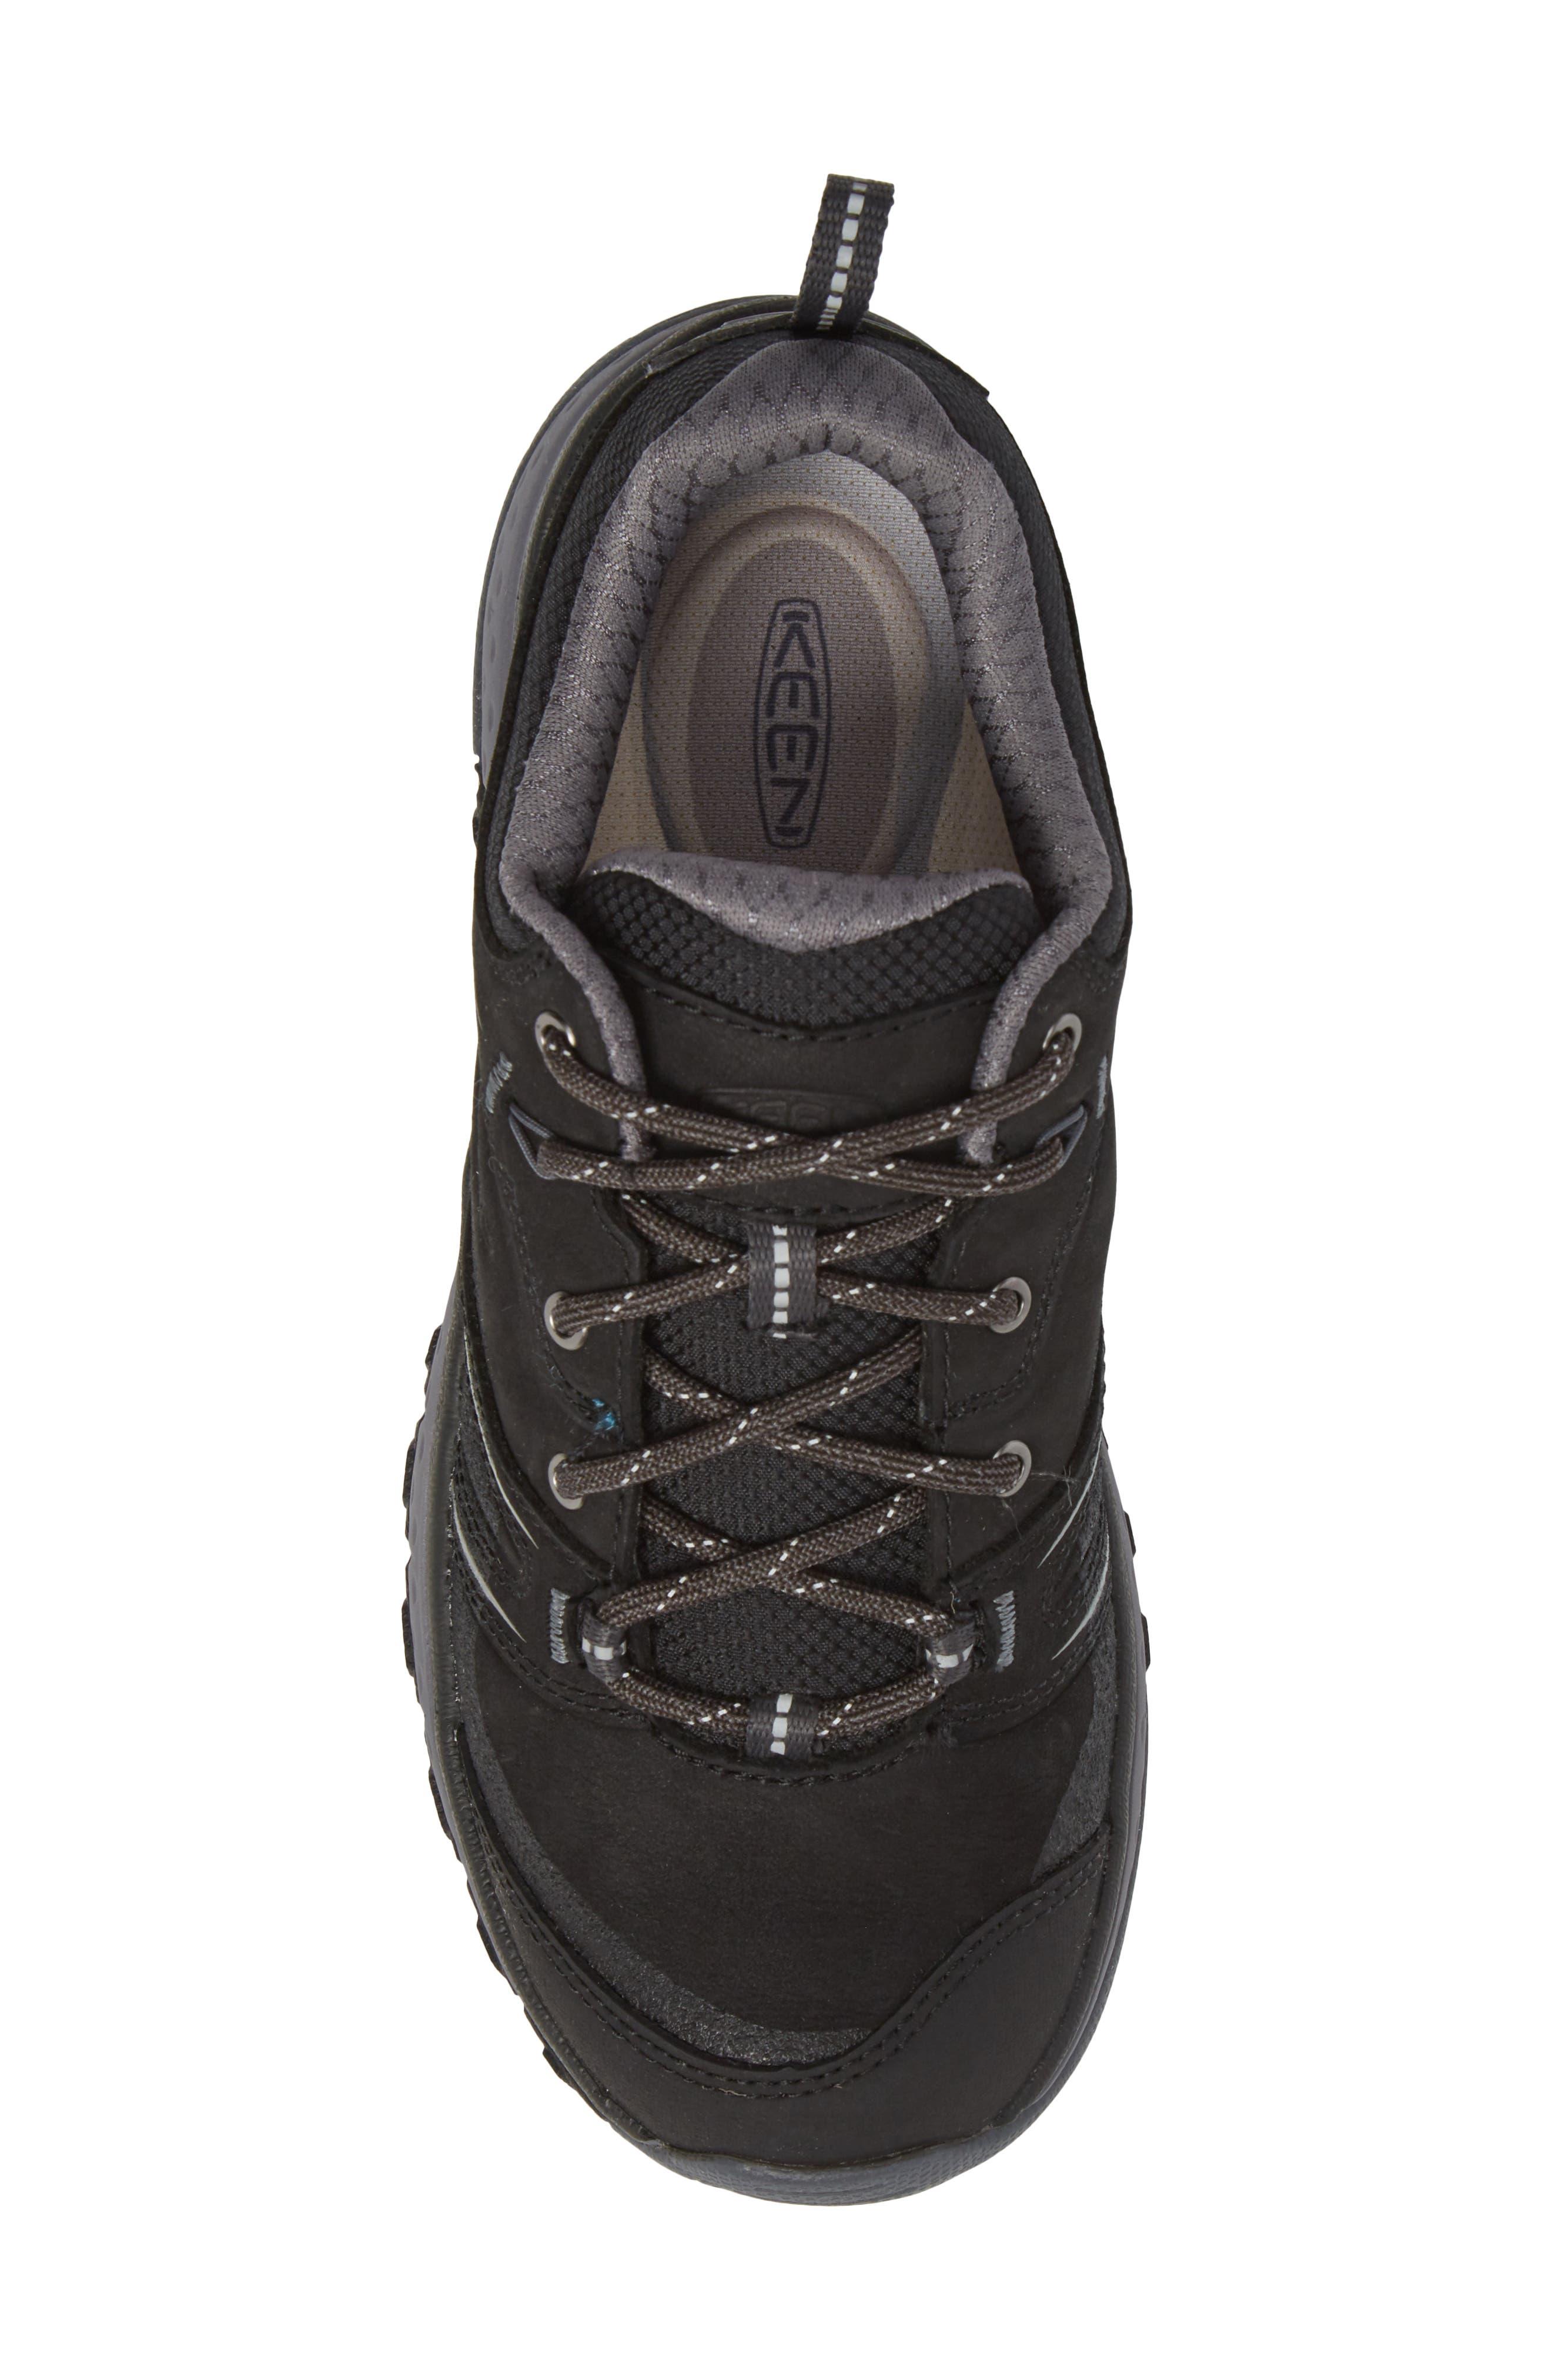 Terradora Waterproof Hiking Shoe,                             Alternate thumbnail 5, color,                             012